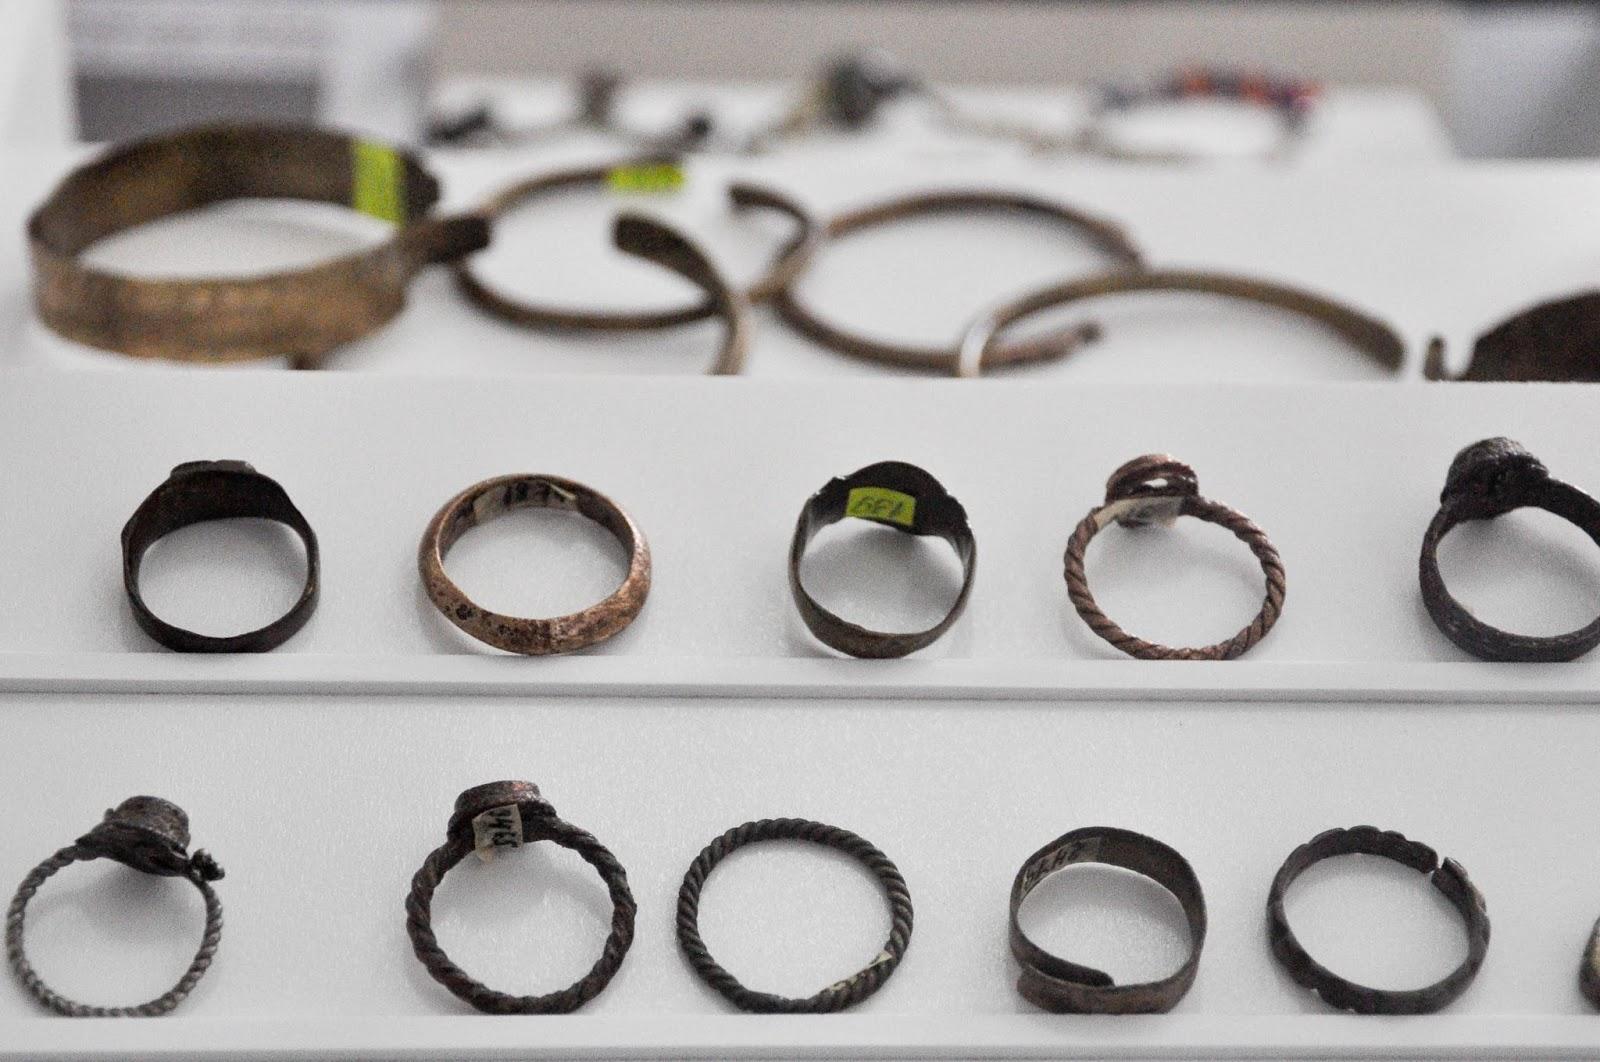 Rings and bracelets, The Museum, Pliska, Bulgaria